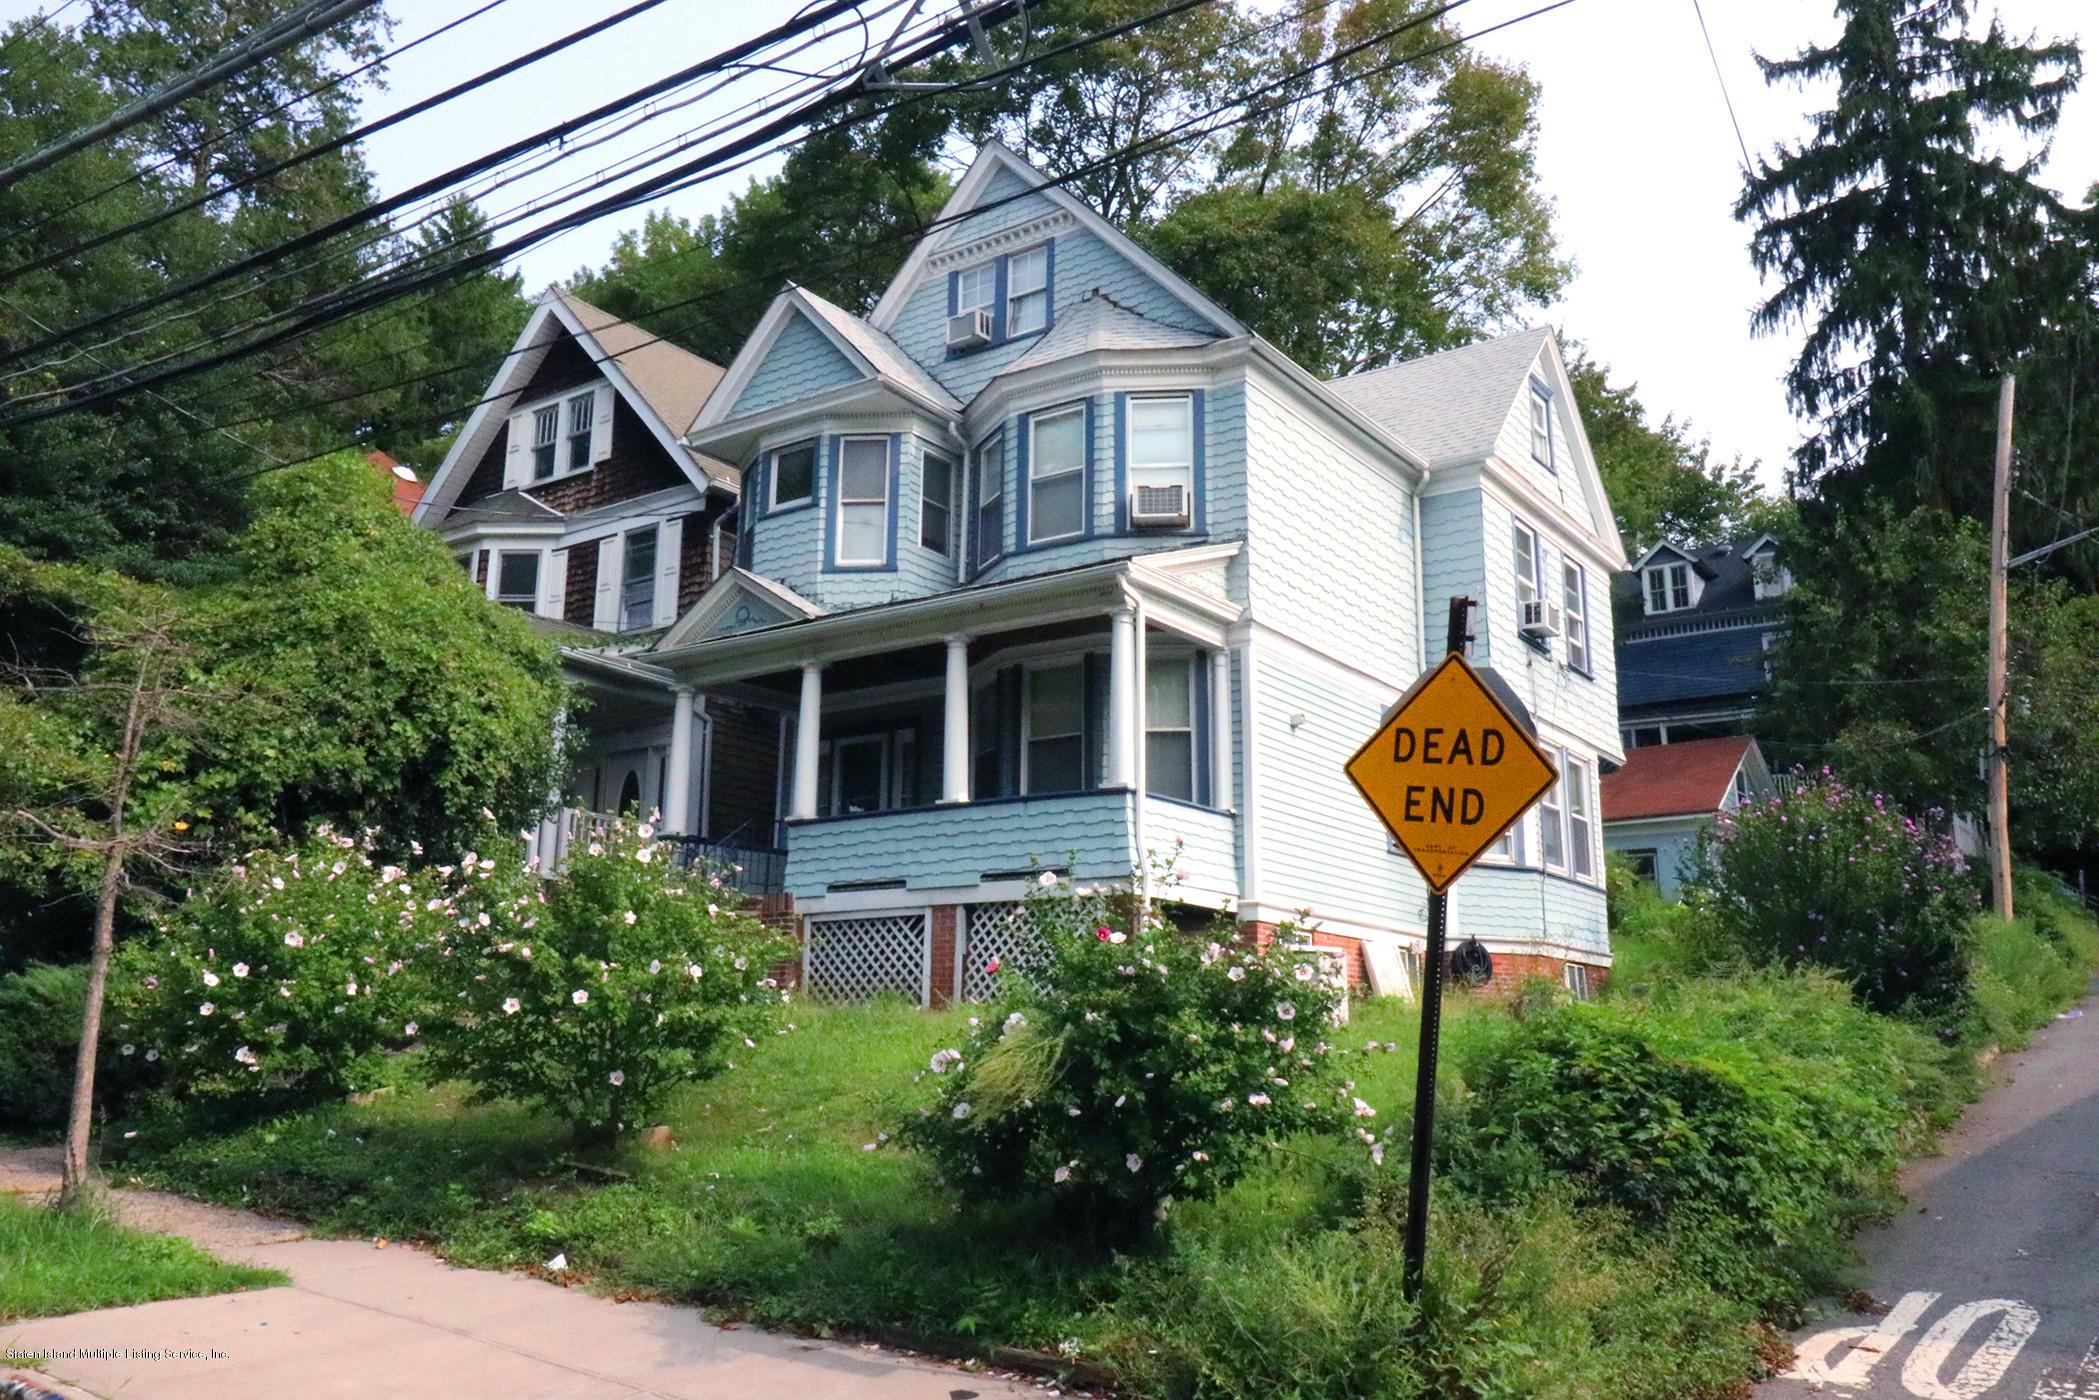 Two Family - Detached 175 Cebra Avenue  Staten Island, NY 10304, MLS-1140817-3